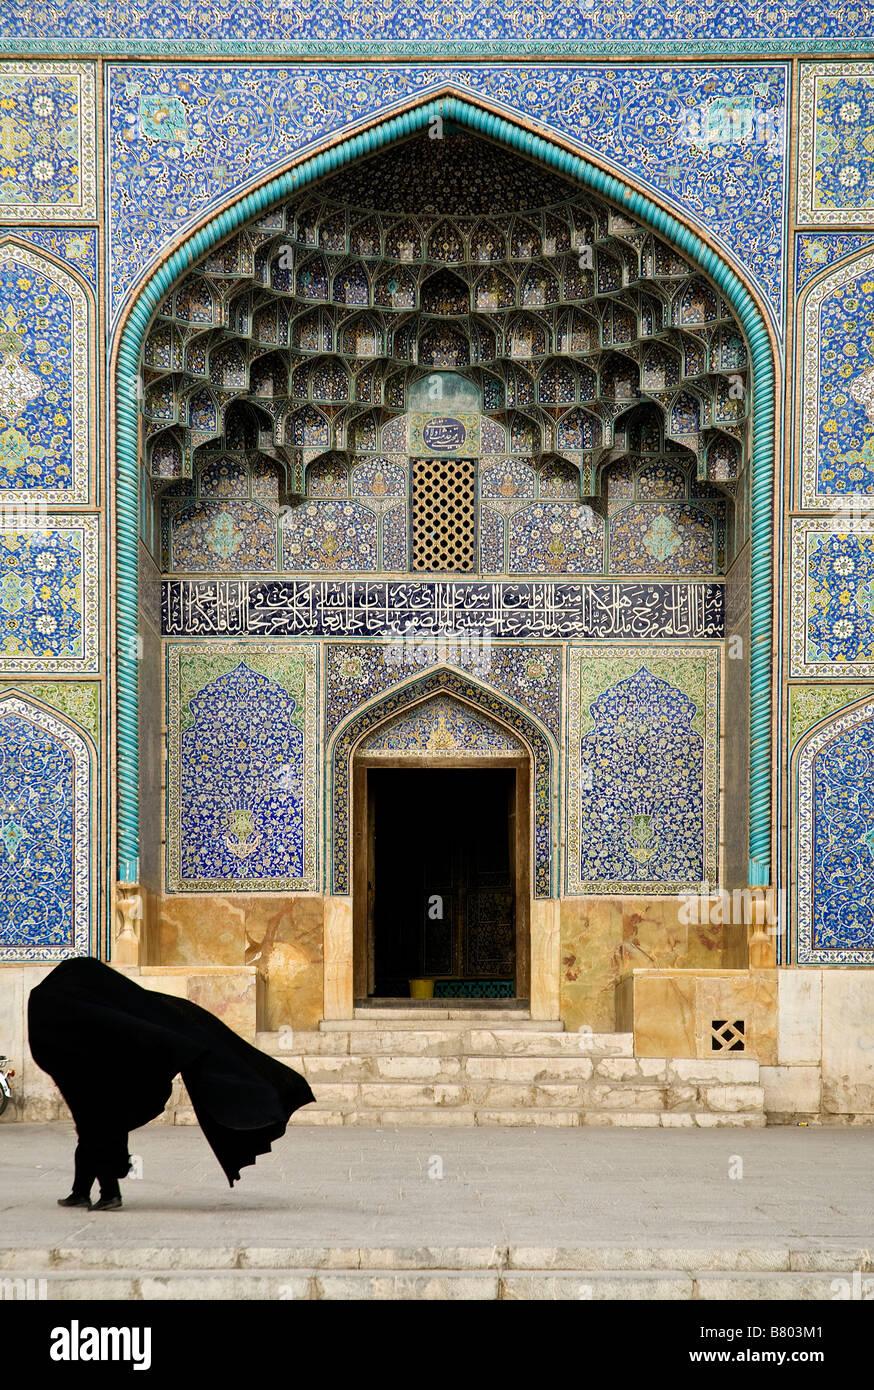 Porte de la mosquée d'Ispahan ispahan en Iran Photo Stock